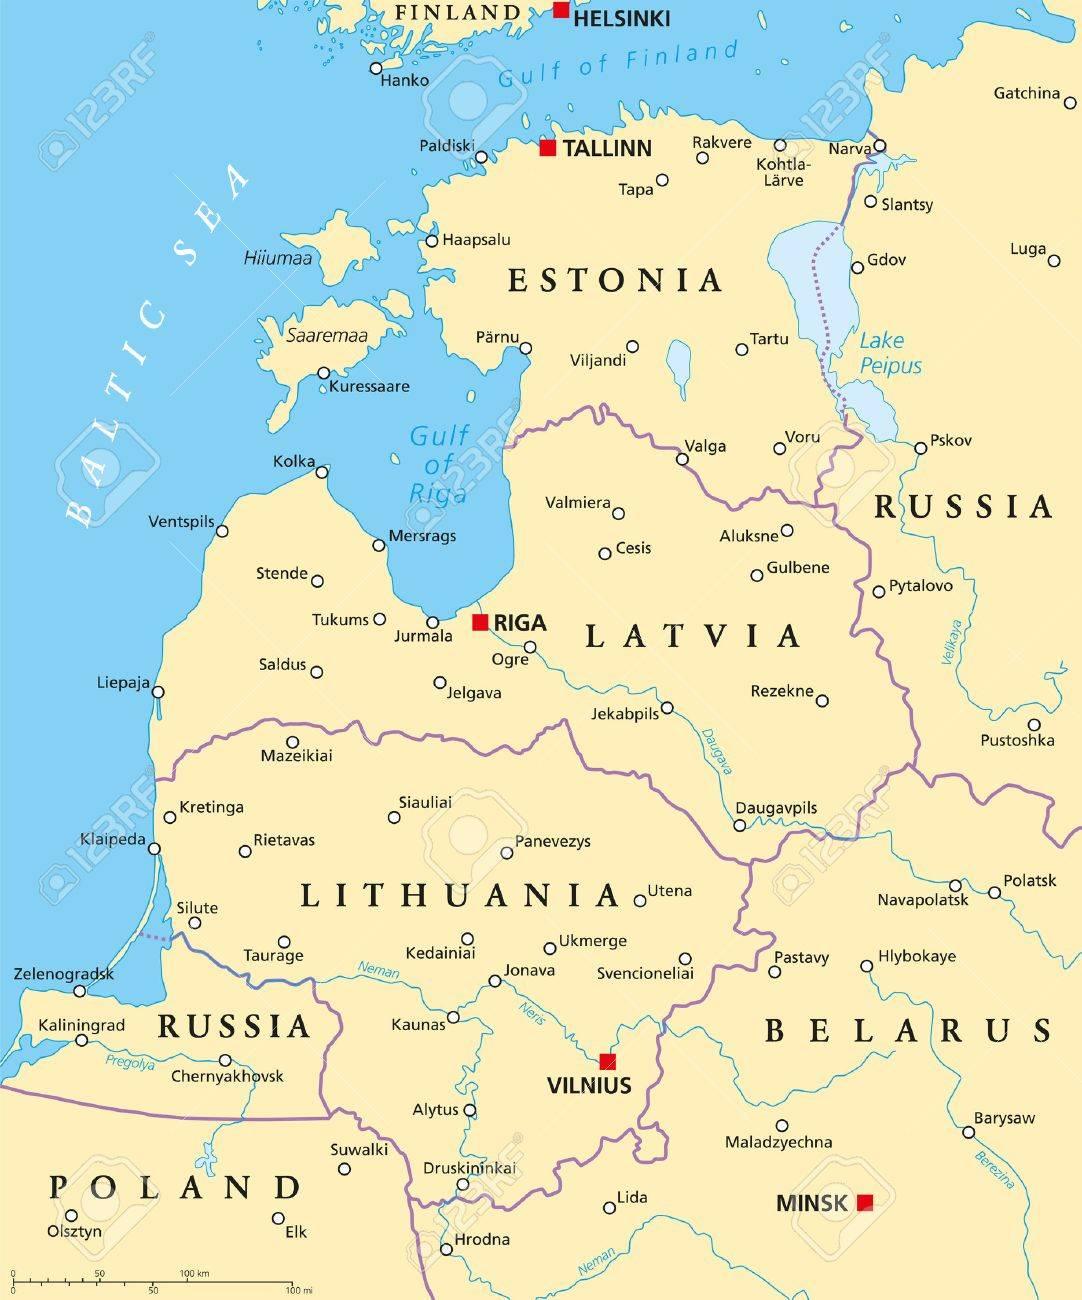 pays baltes carte - Image